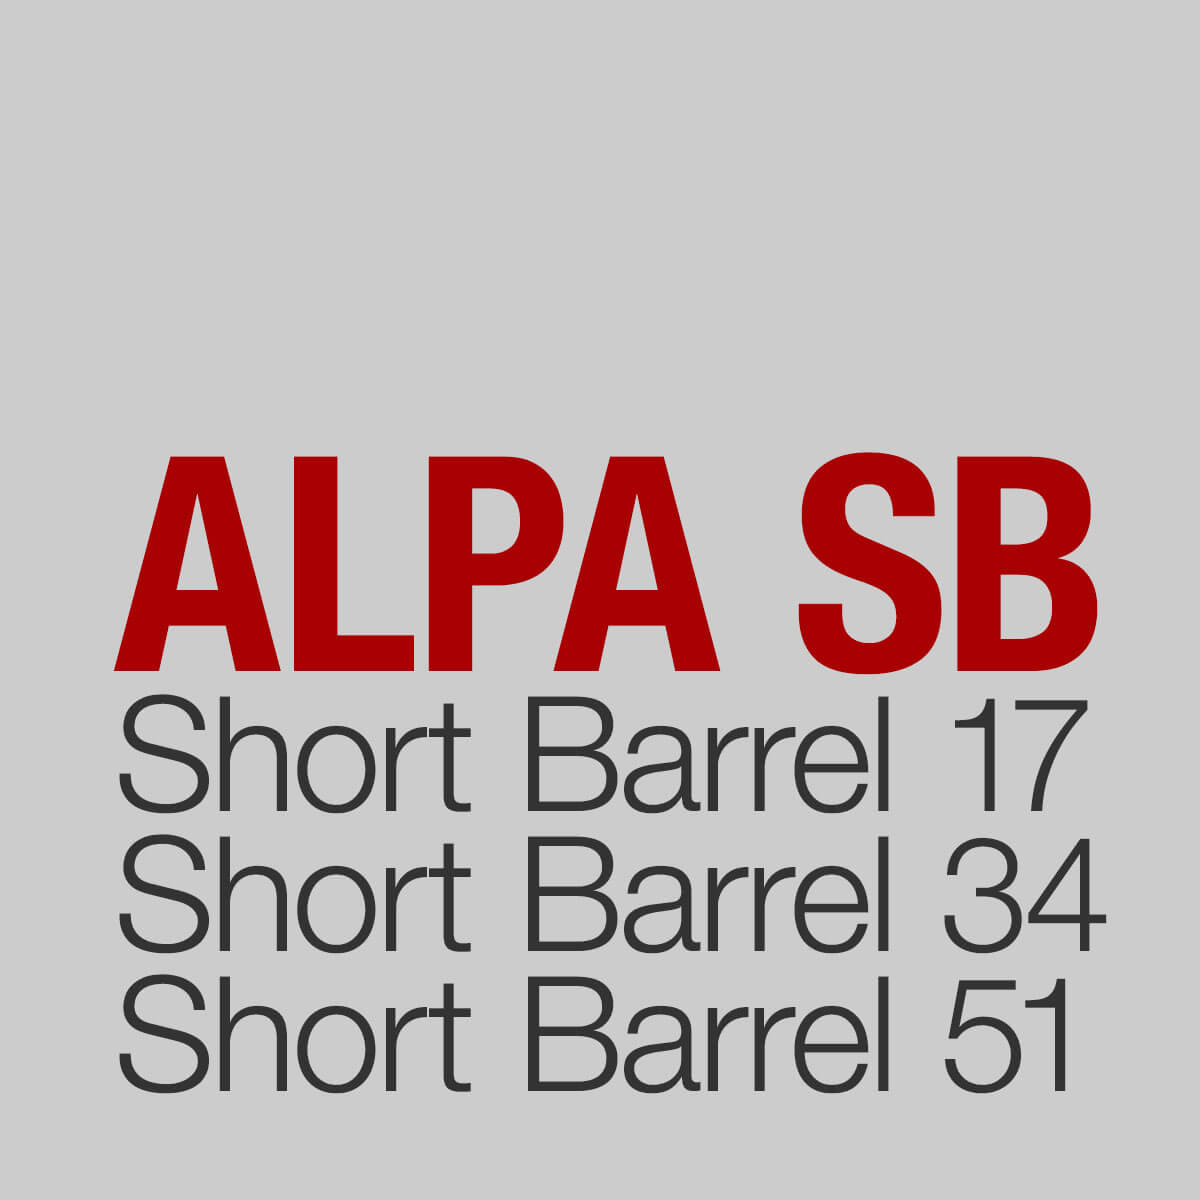 The History of the ALPA Short Barrel Concept